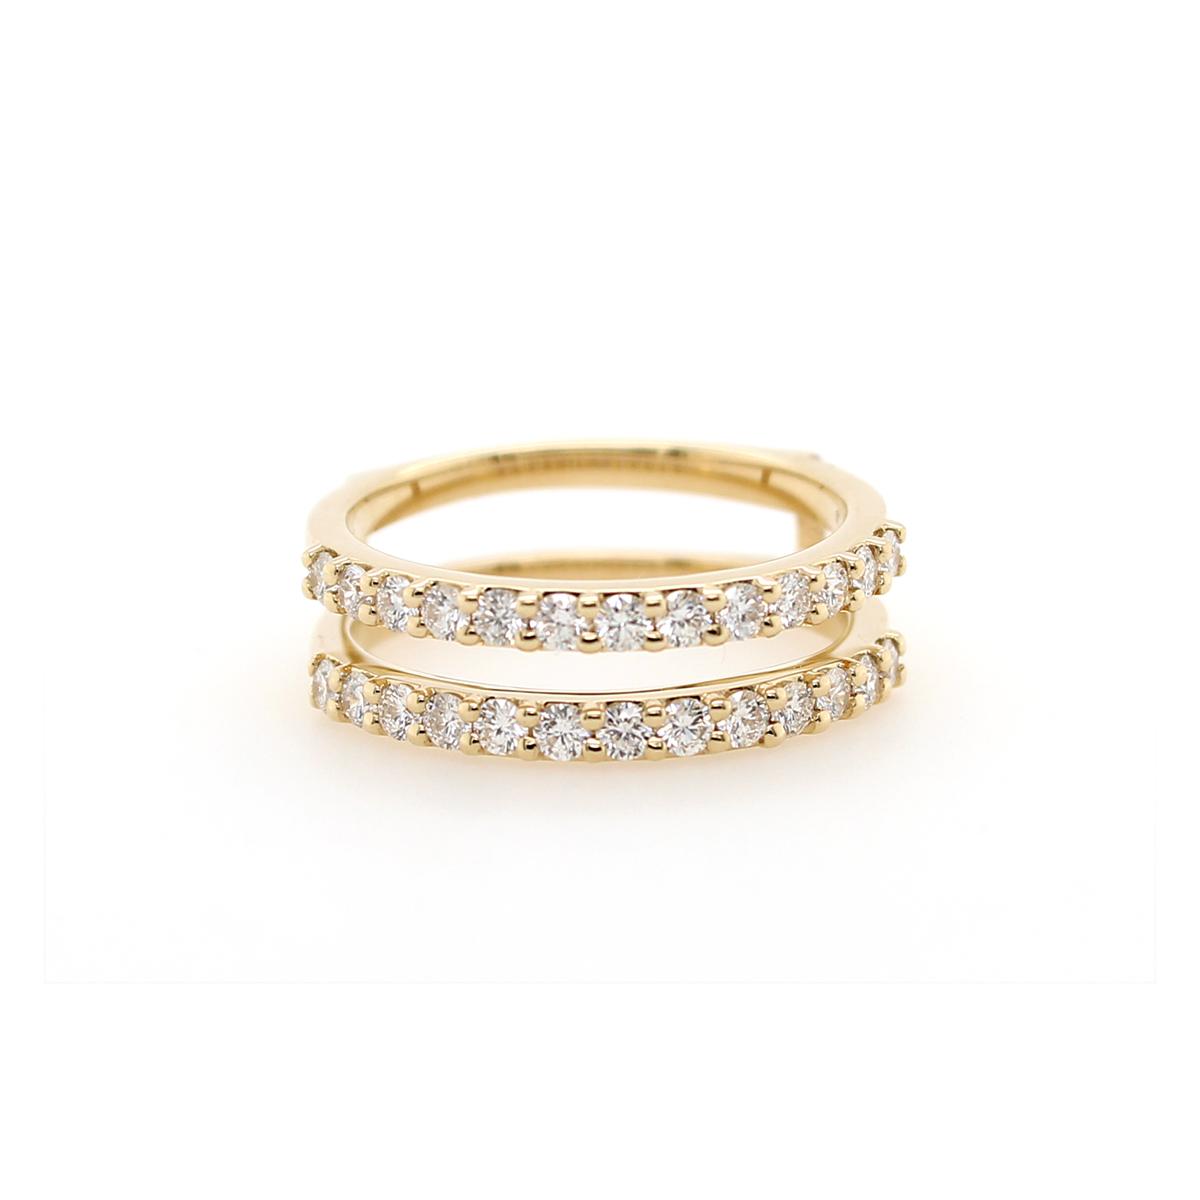 Shefi Diamonds 14 Karat Yellow Gold .75 Carat Diamond Ring Jacket